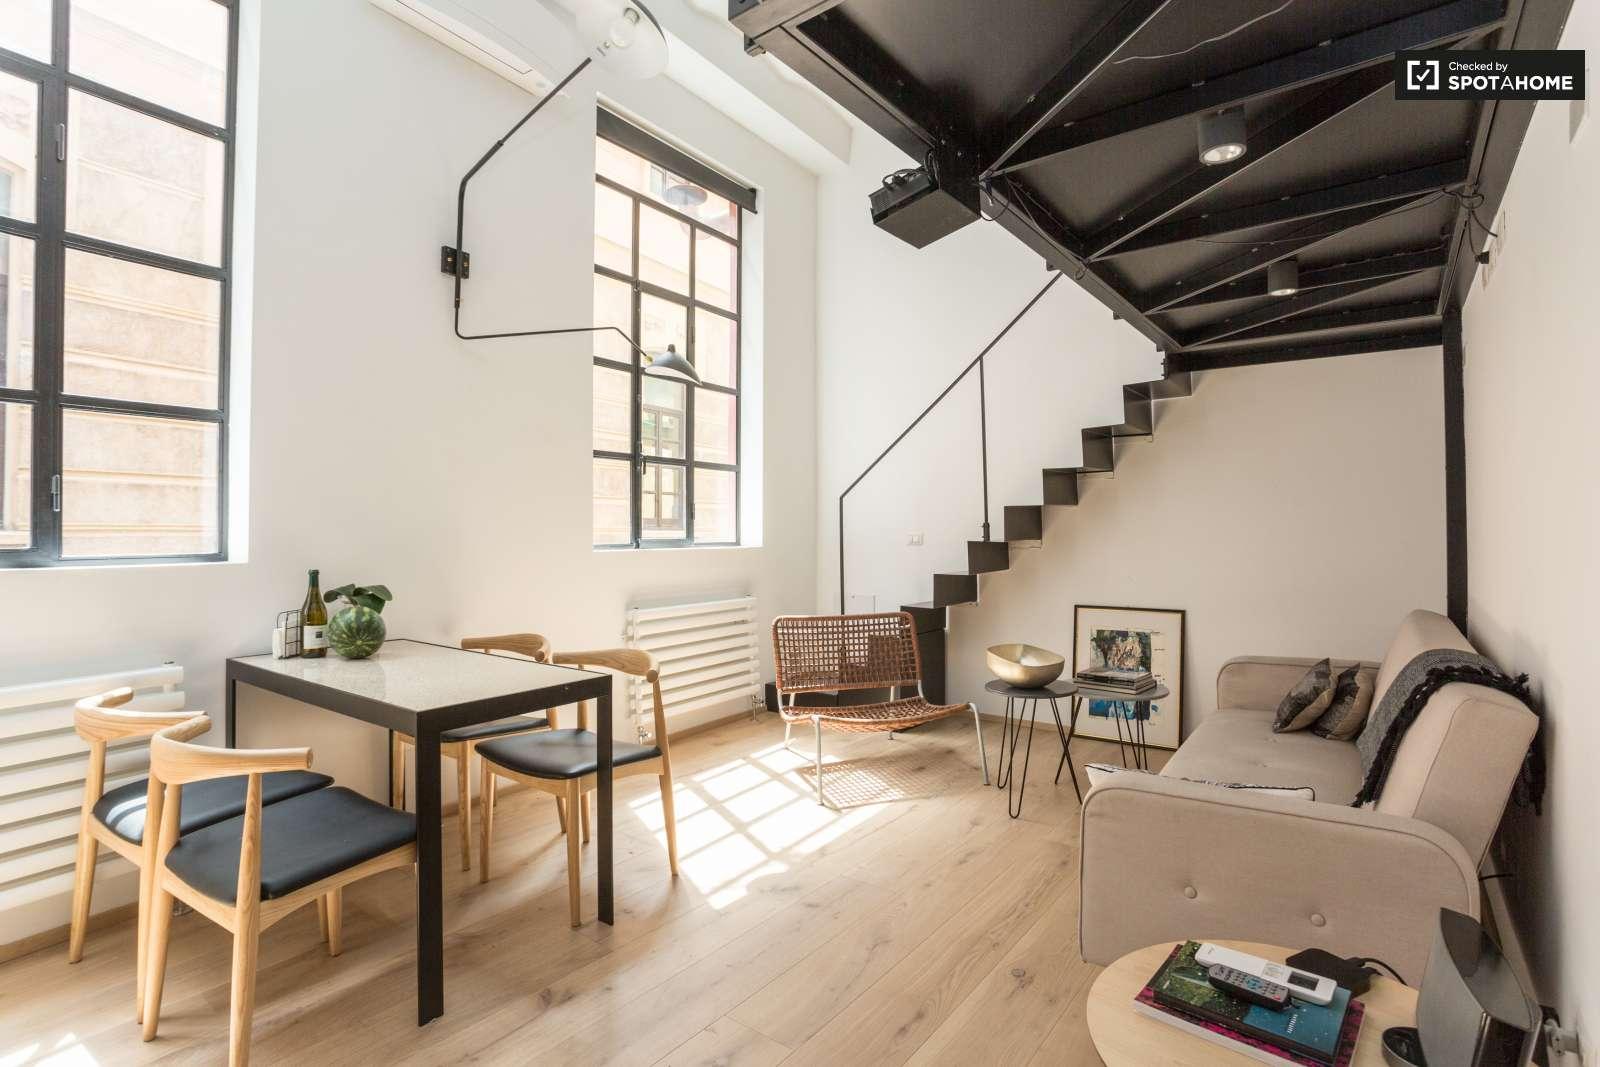 Studio apartment with mezzanine for rent in Garibaldi Milan ref 132767  Spotahome